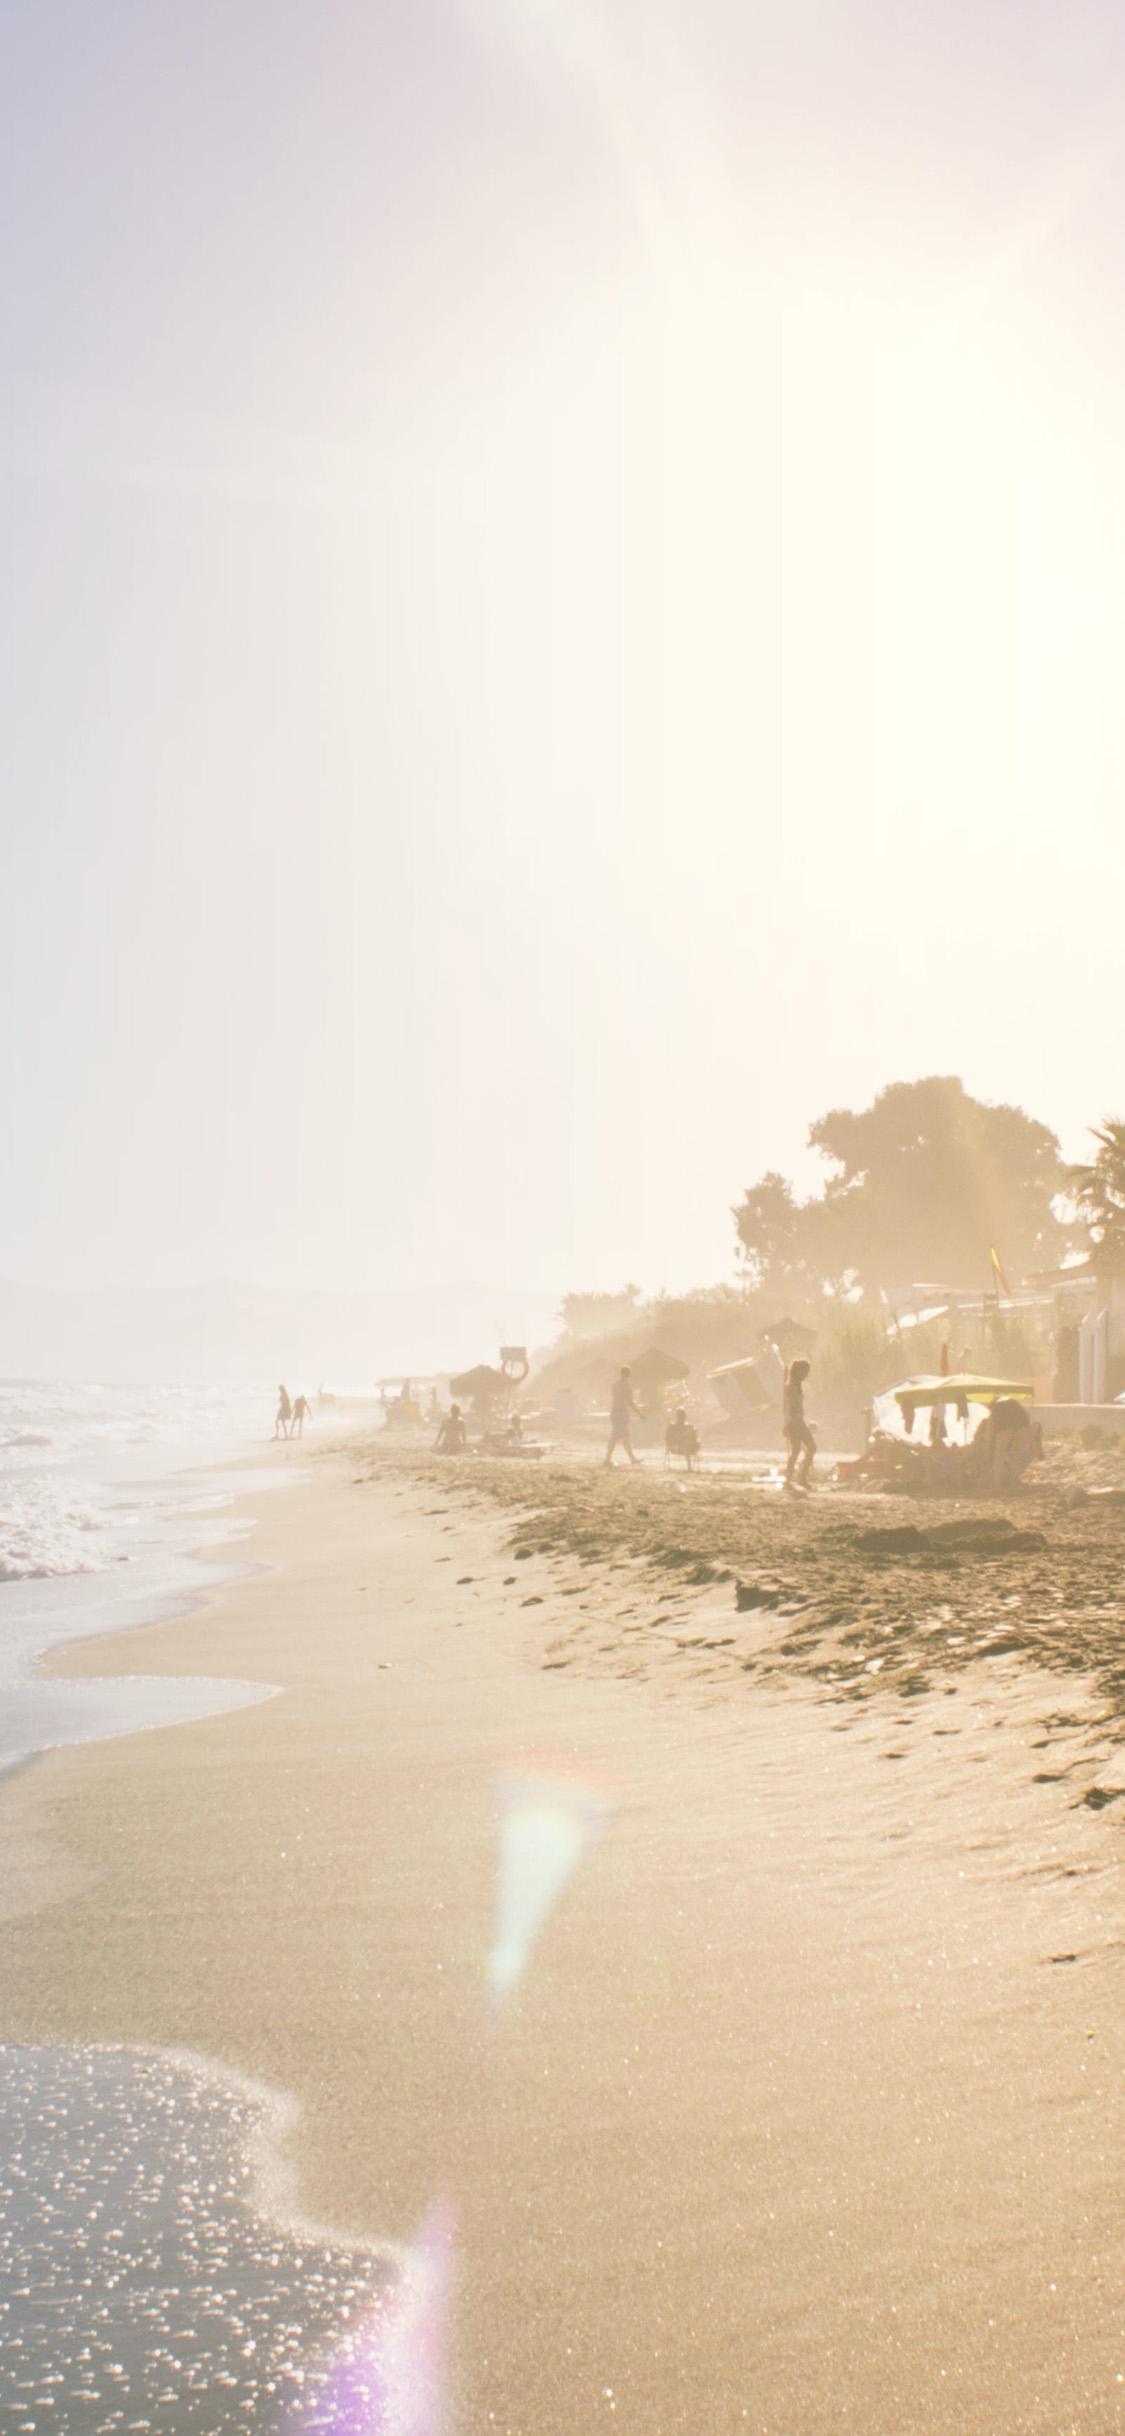 iPhonexpapers.com-Apple-iPhone-wallpaper-oe10-nature-beach-sea-play